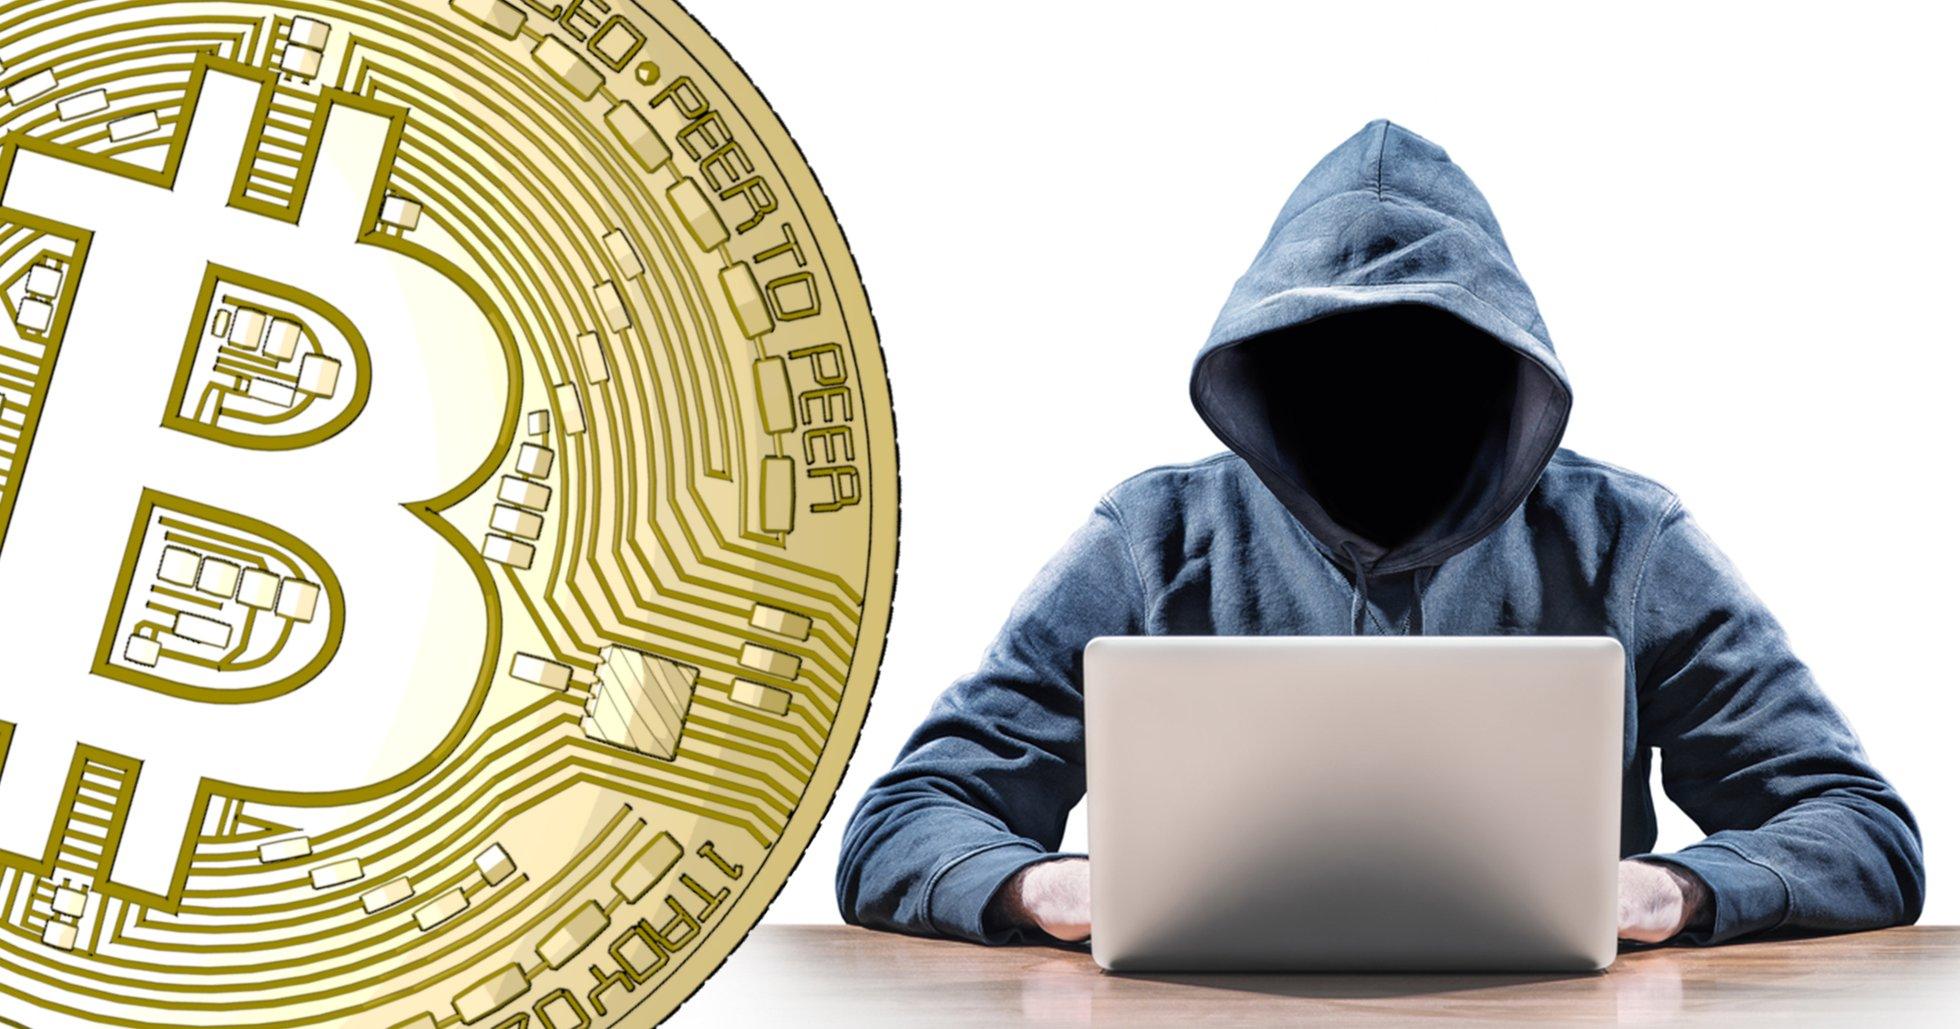 Bitcoin-tjuvar gripna – stal över 250 miljoner kronor